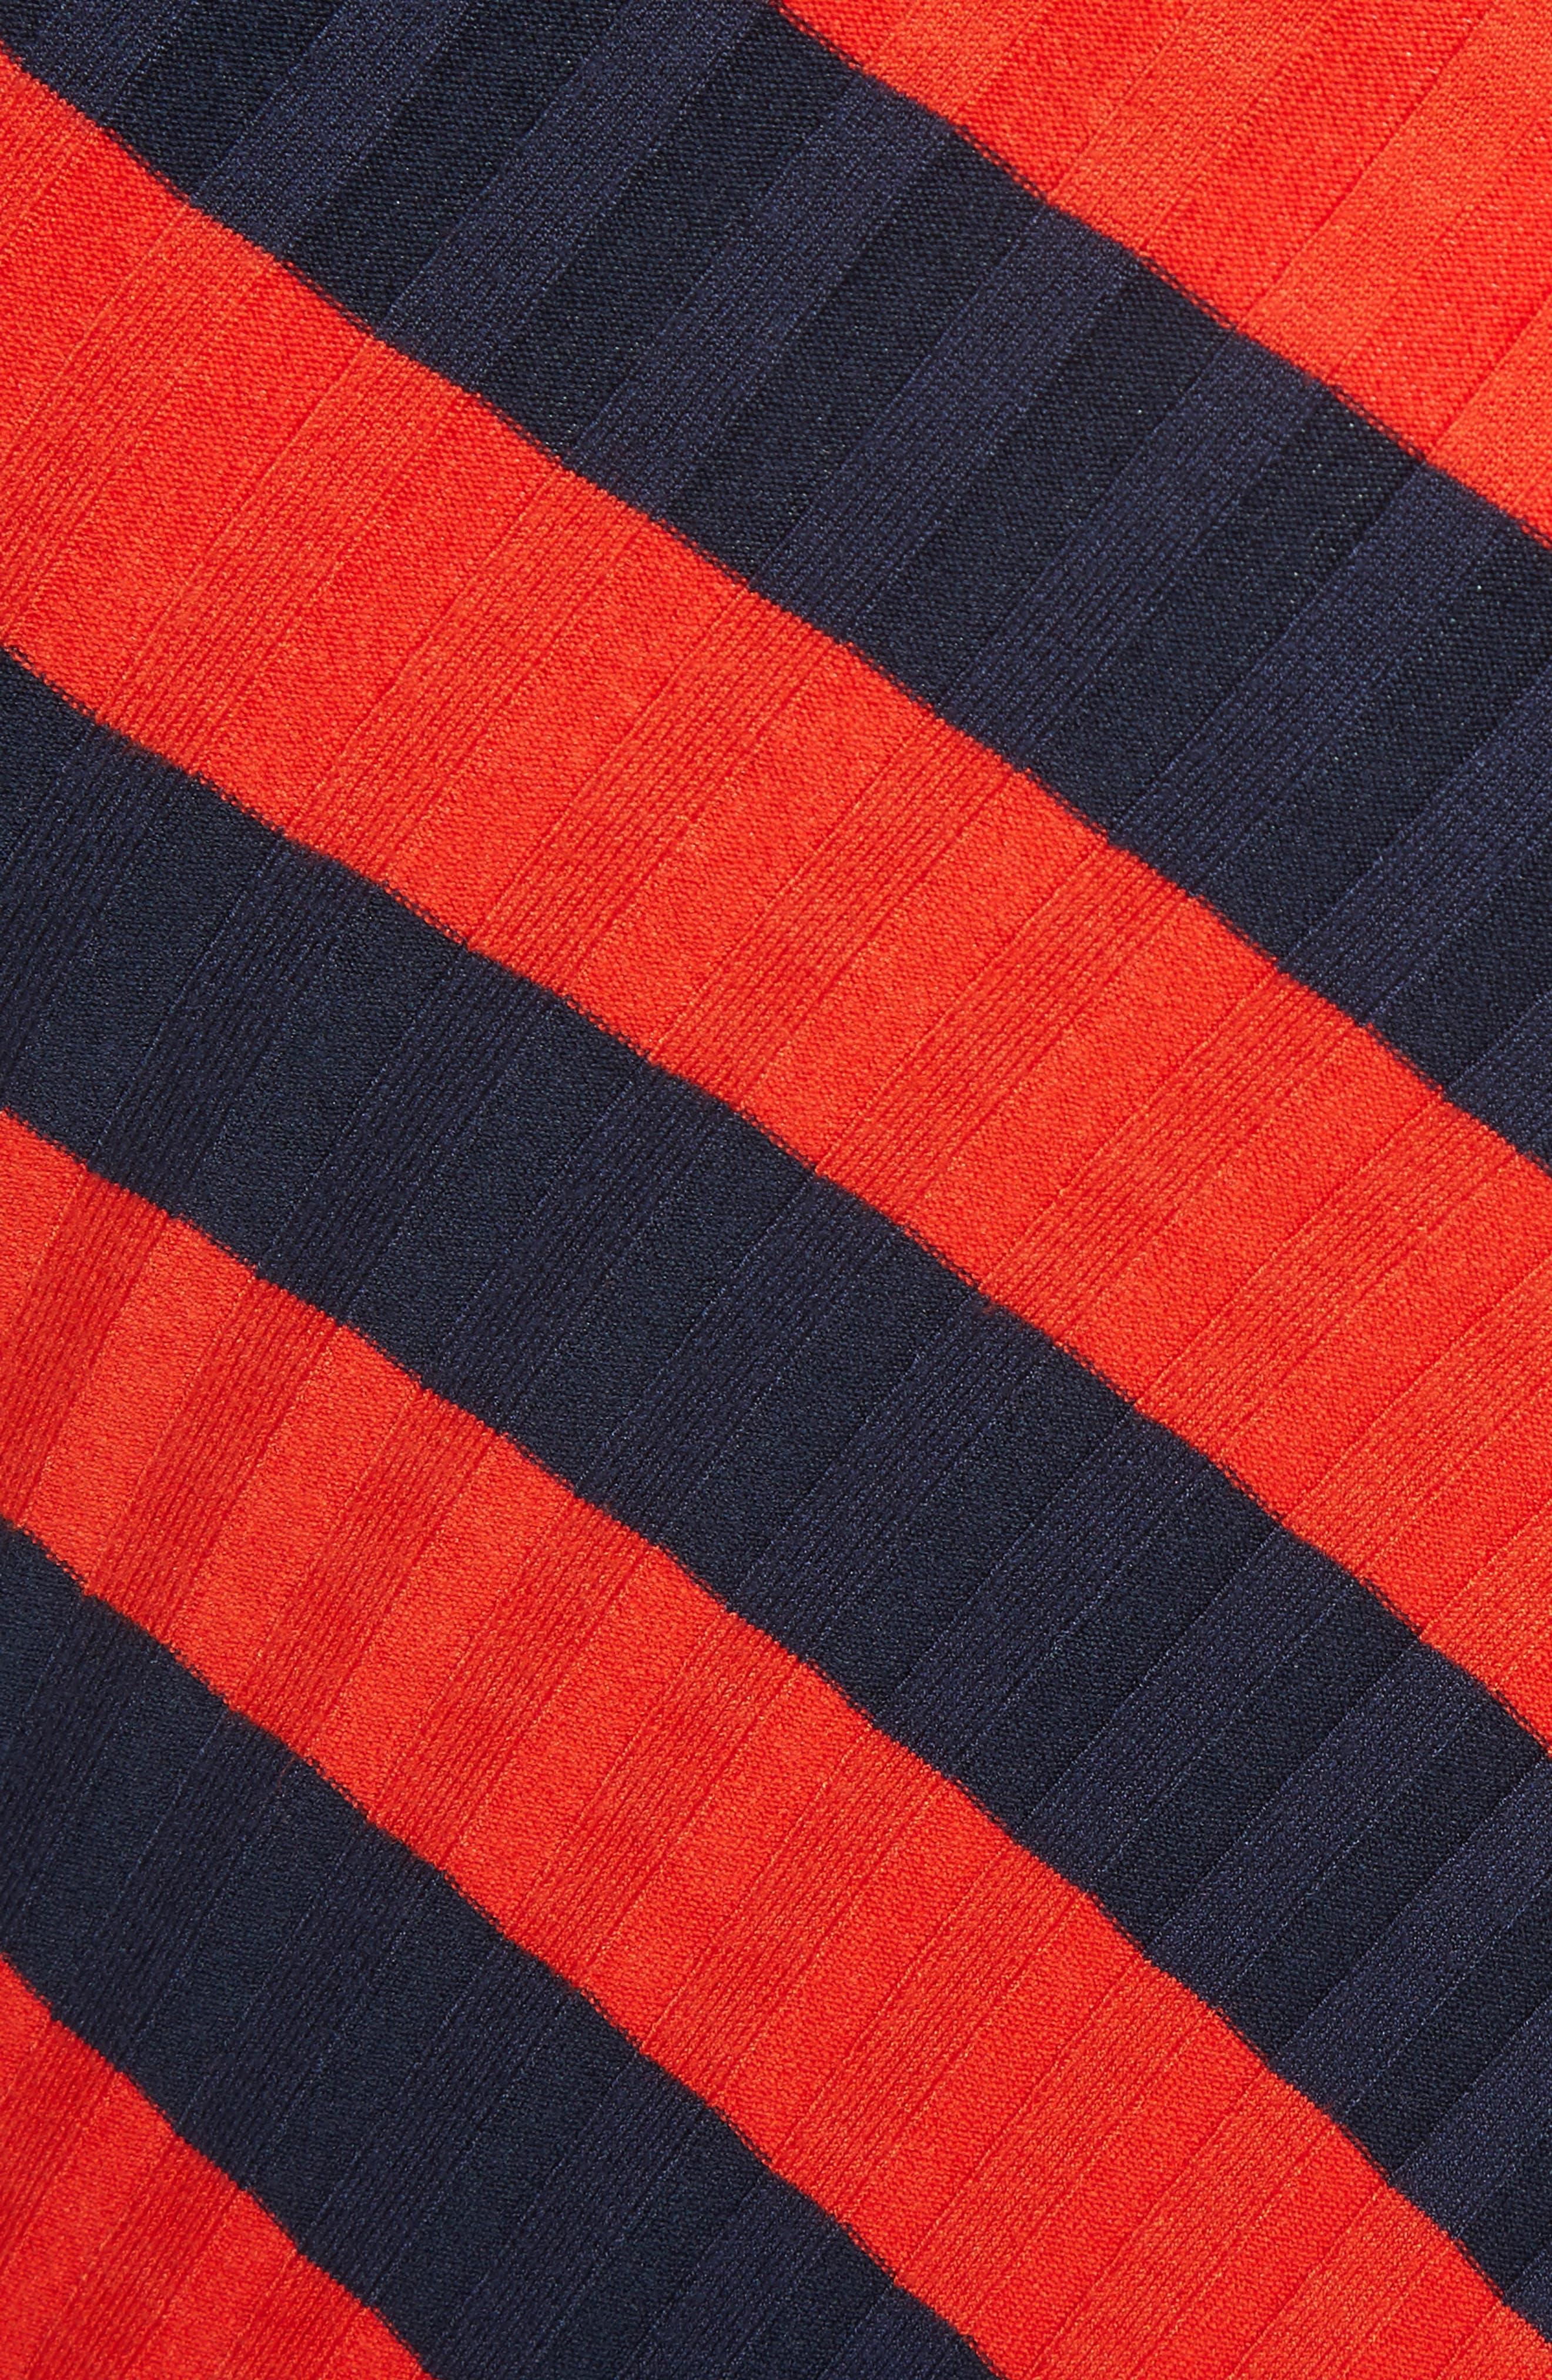 Asymmetrical Stripe Midi Skirt,                             Alternate thumbnail 5, color,                             830